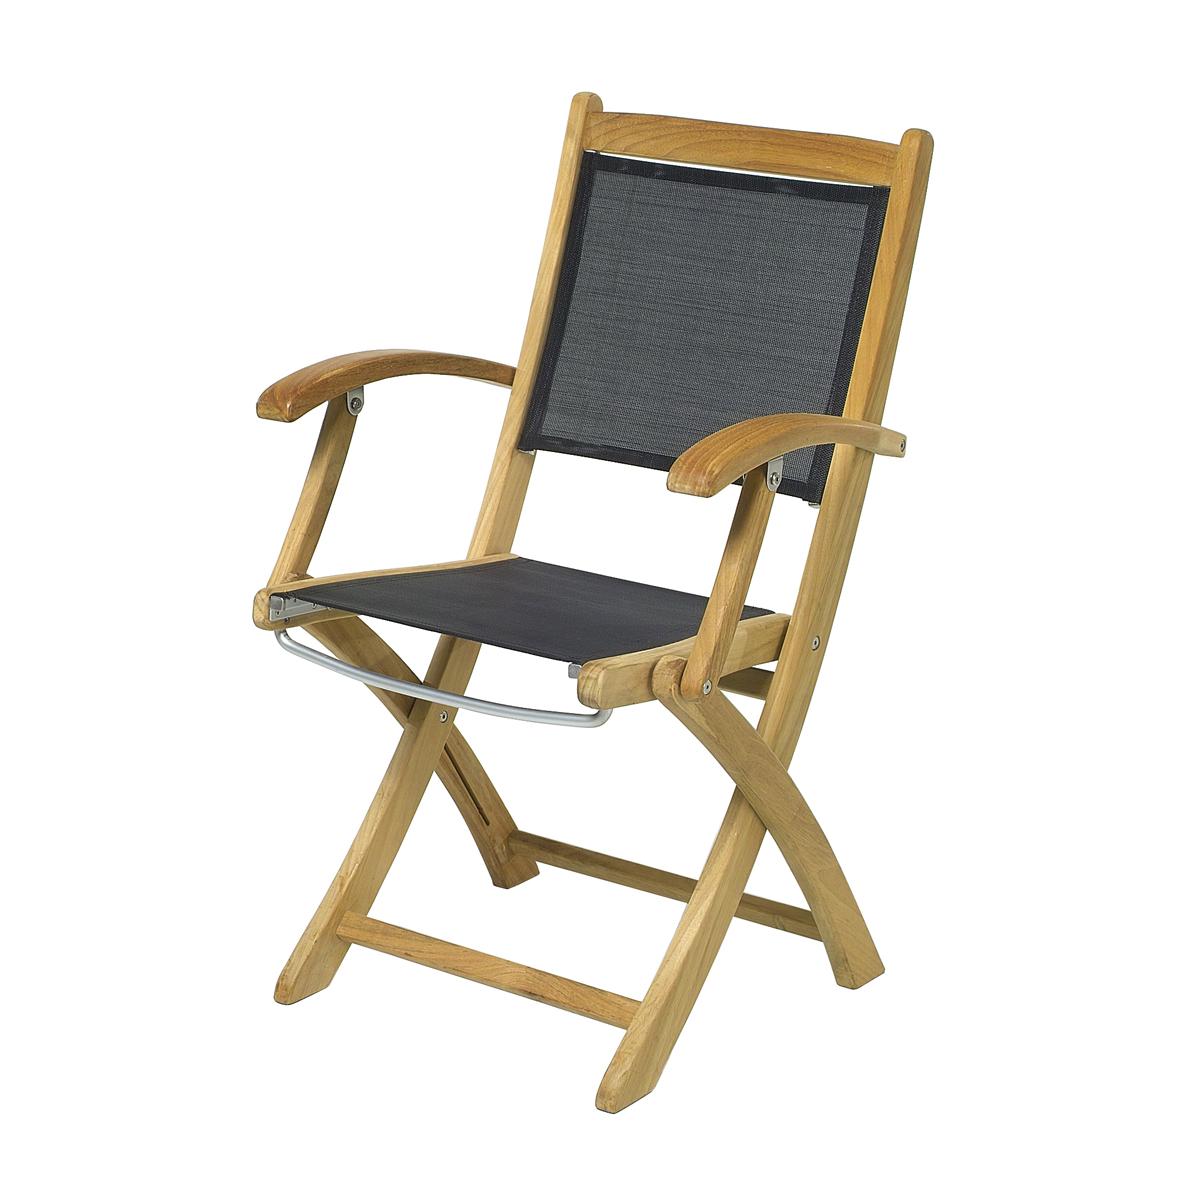 garten klappsessel mit armlehne teak. Black Bedroom Furniture Sets. Home Design Ideas